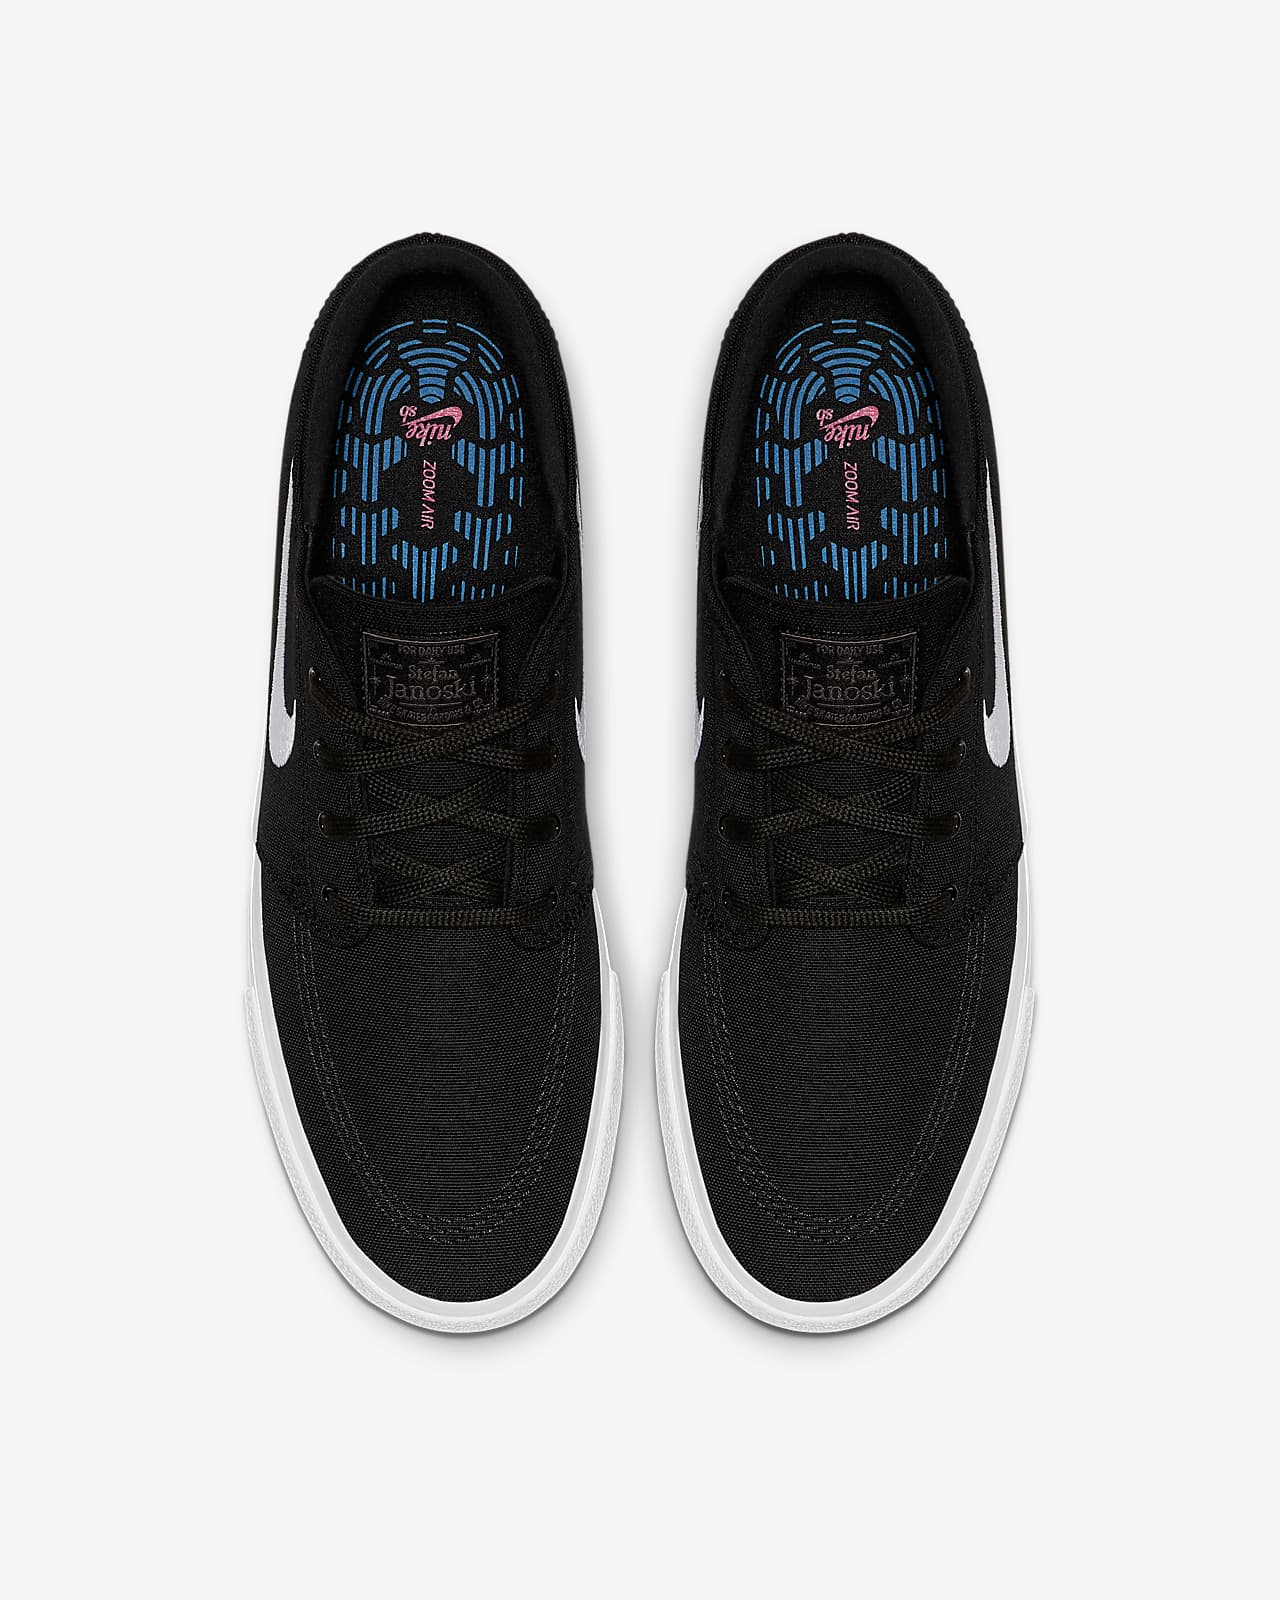 Nike SB Zoom Stefan Janoski Canvas RM Skate Shoes